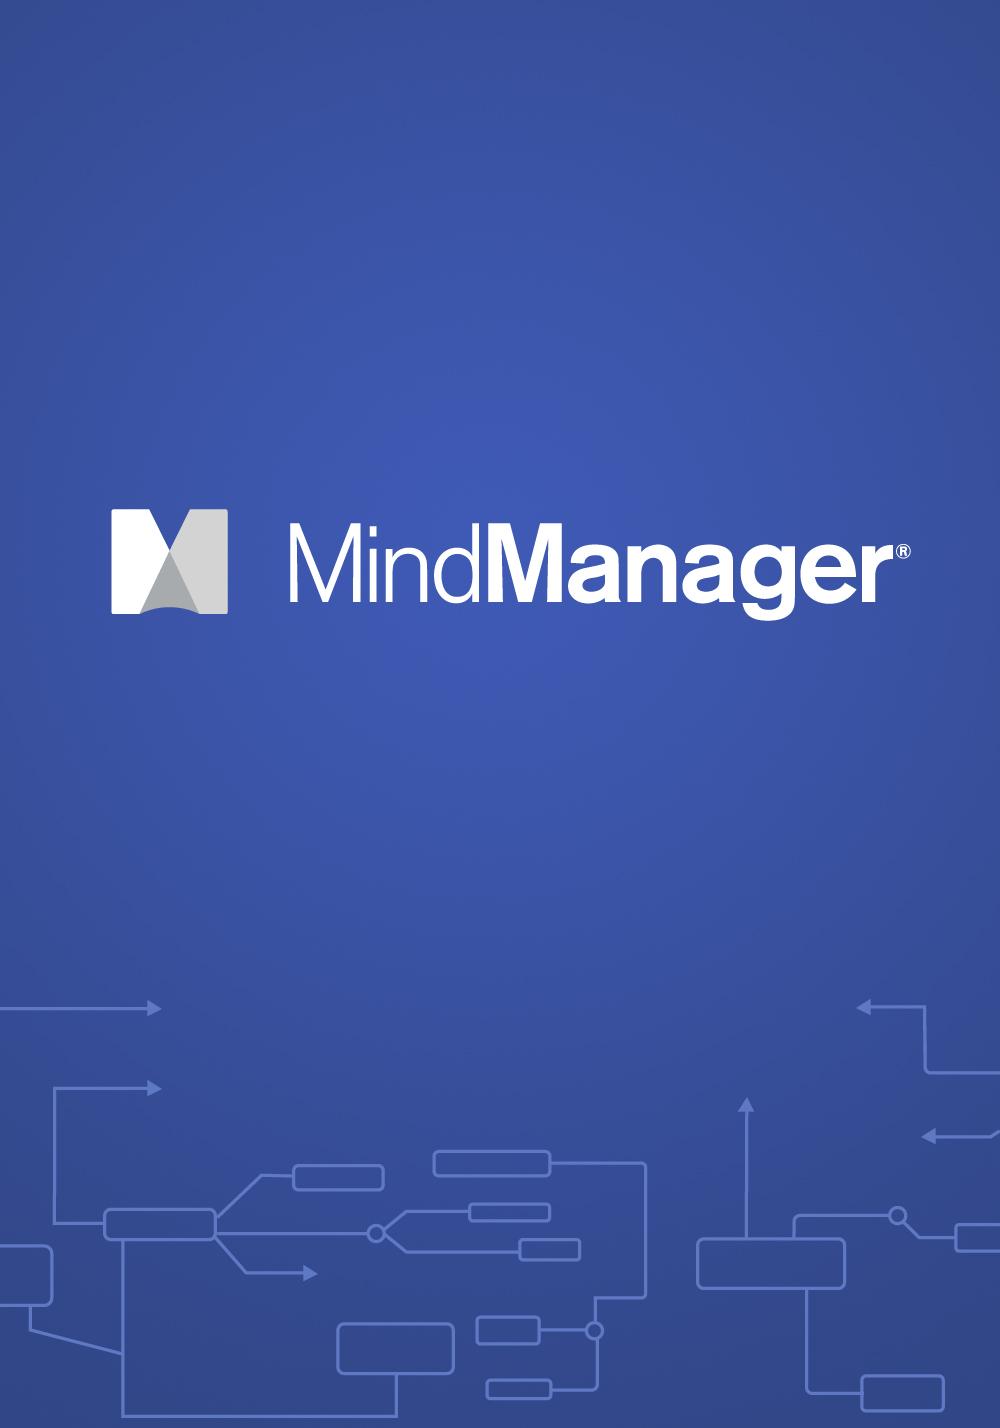 MindManager 2017 for Windows